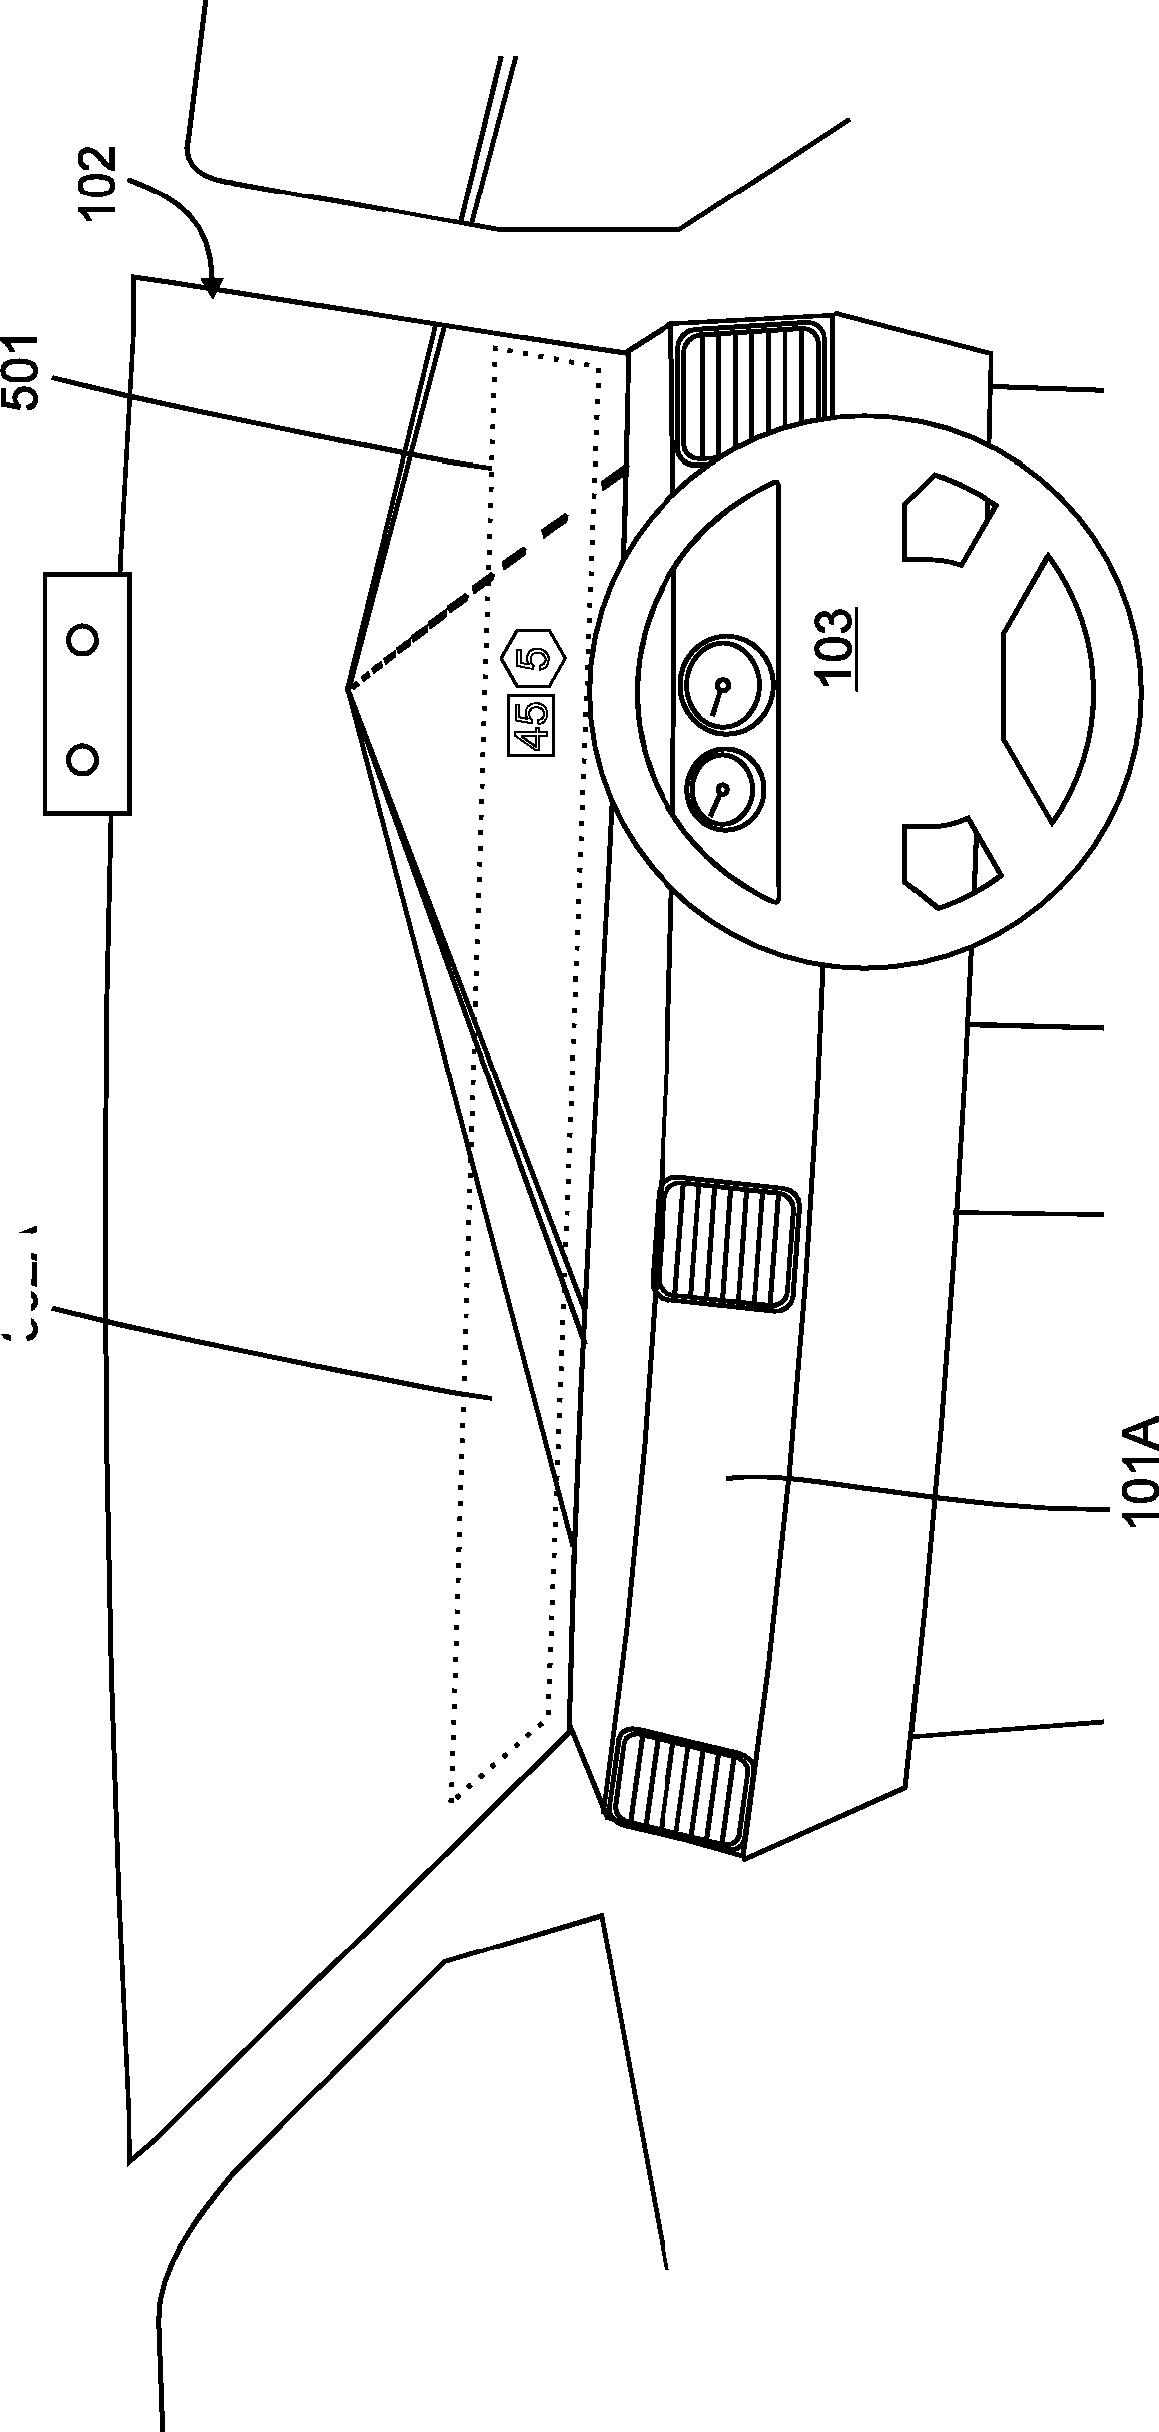 Figure GB2559606A_D0006